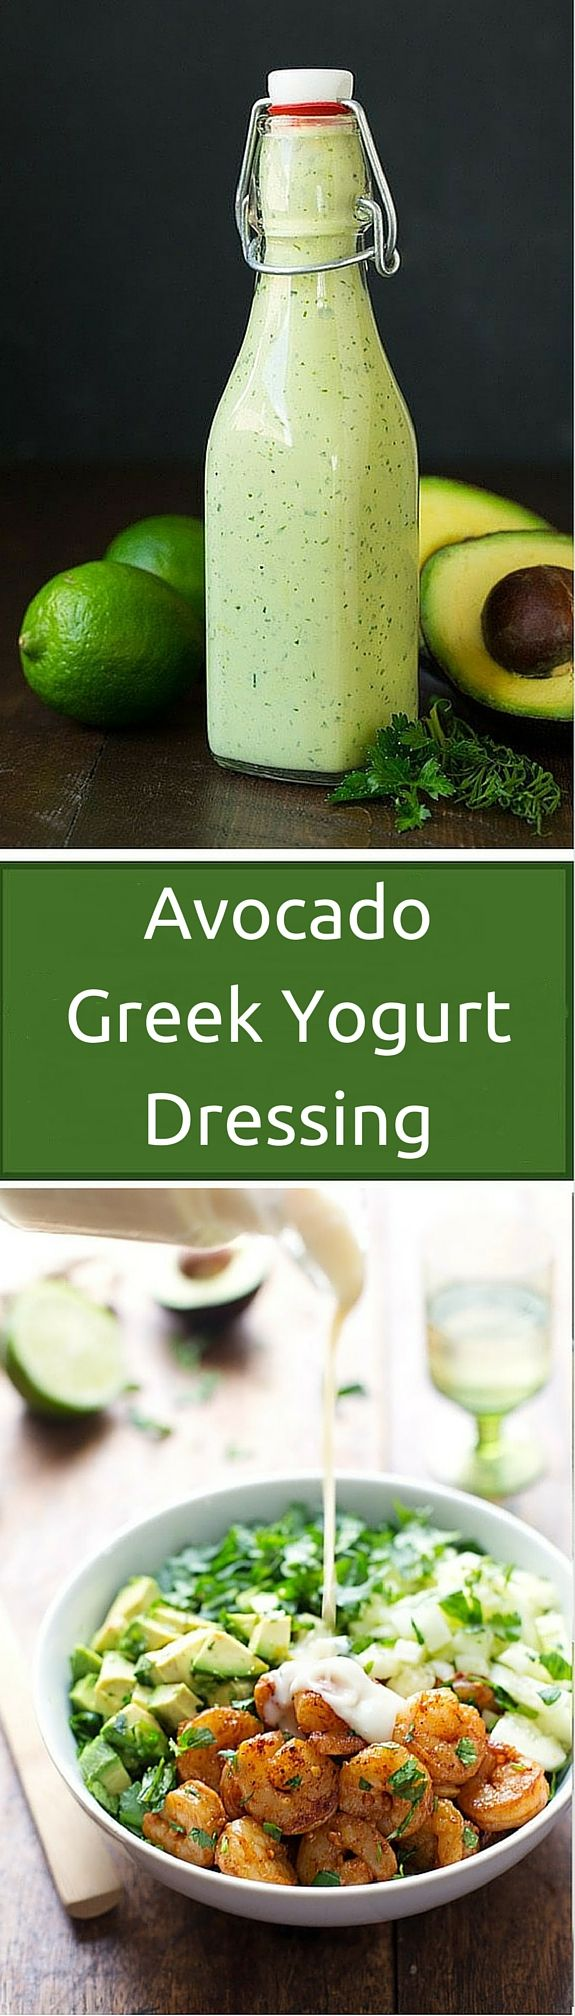 healthy dressing recipe